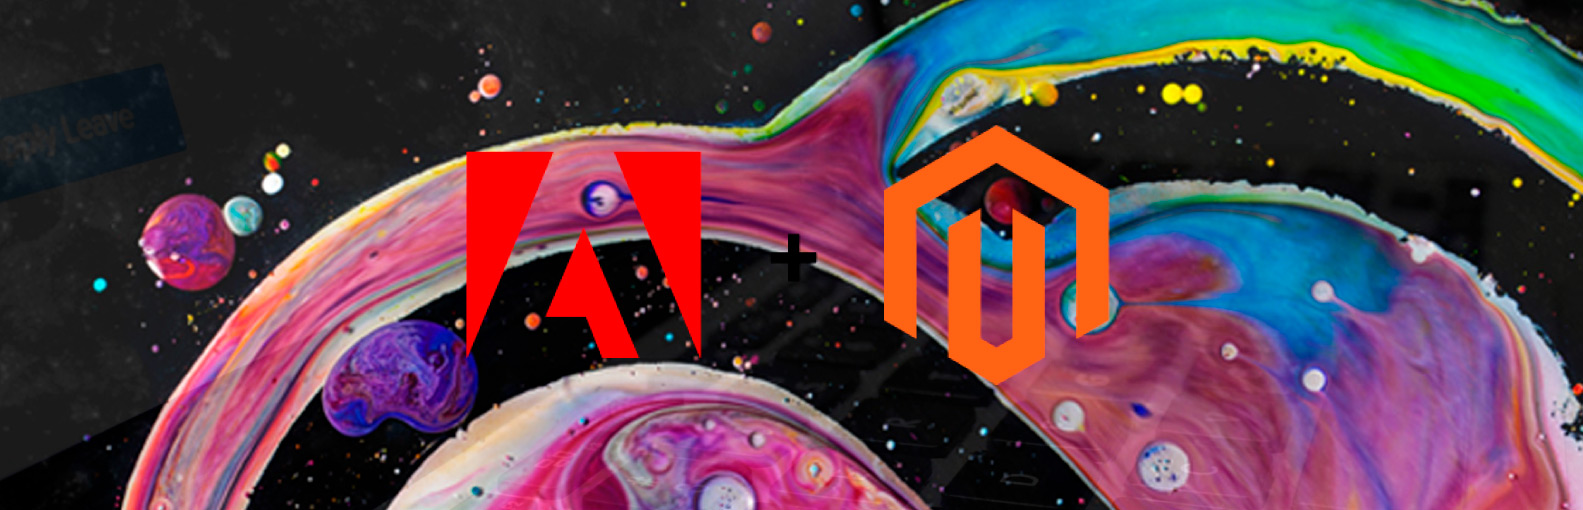 Adobe acquiert Magento